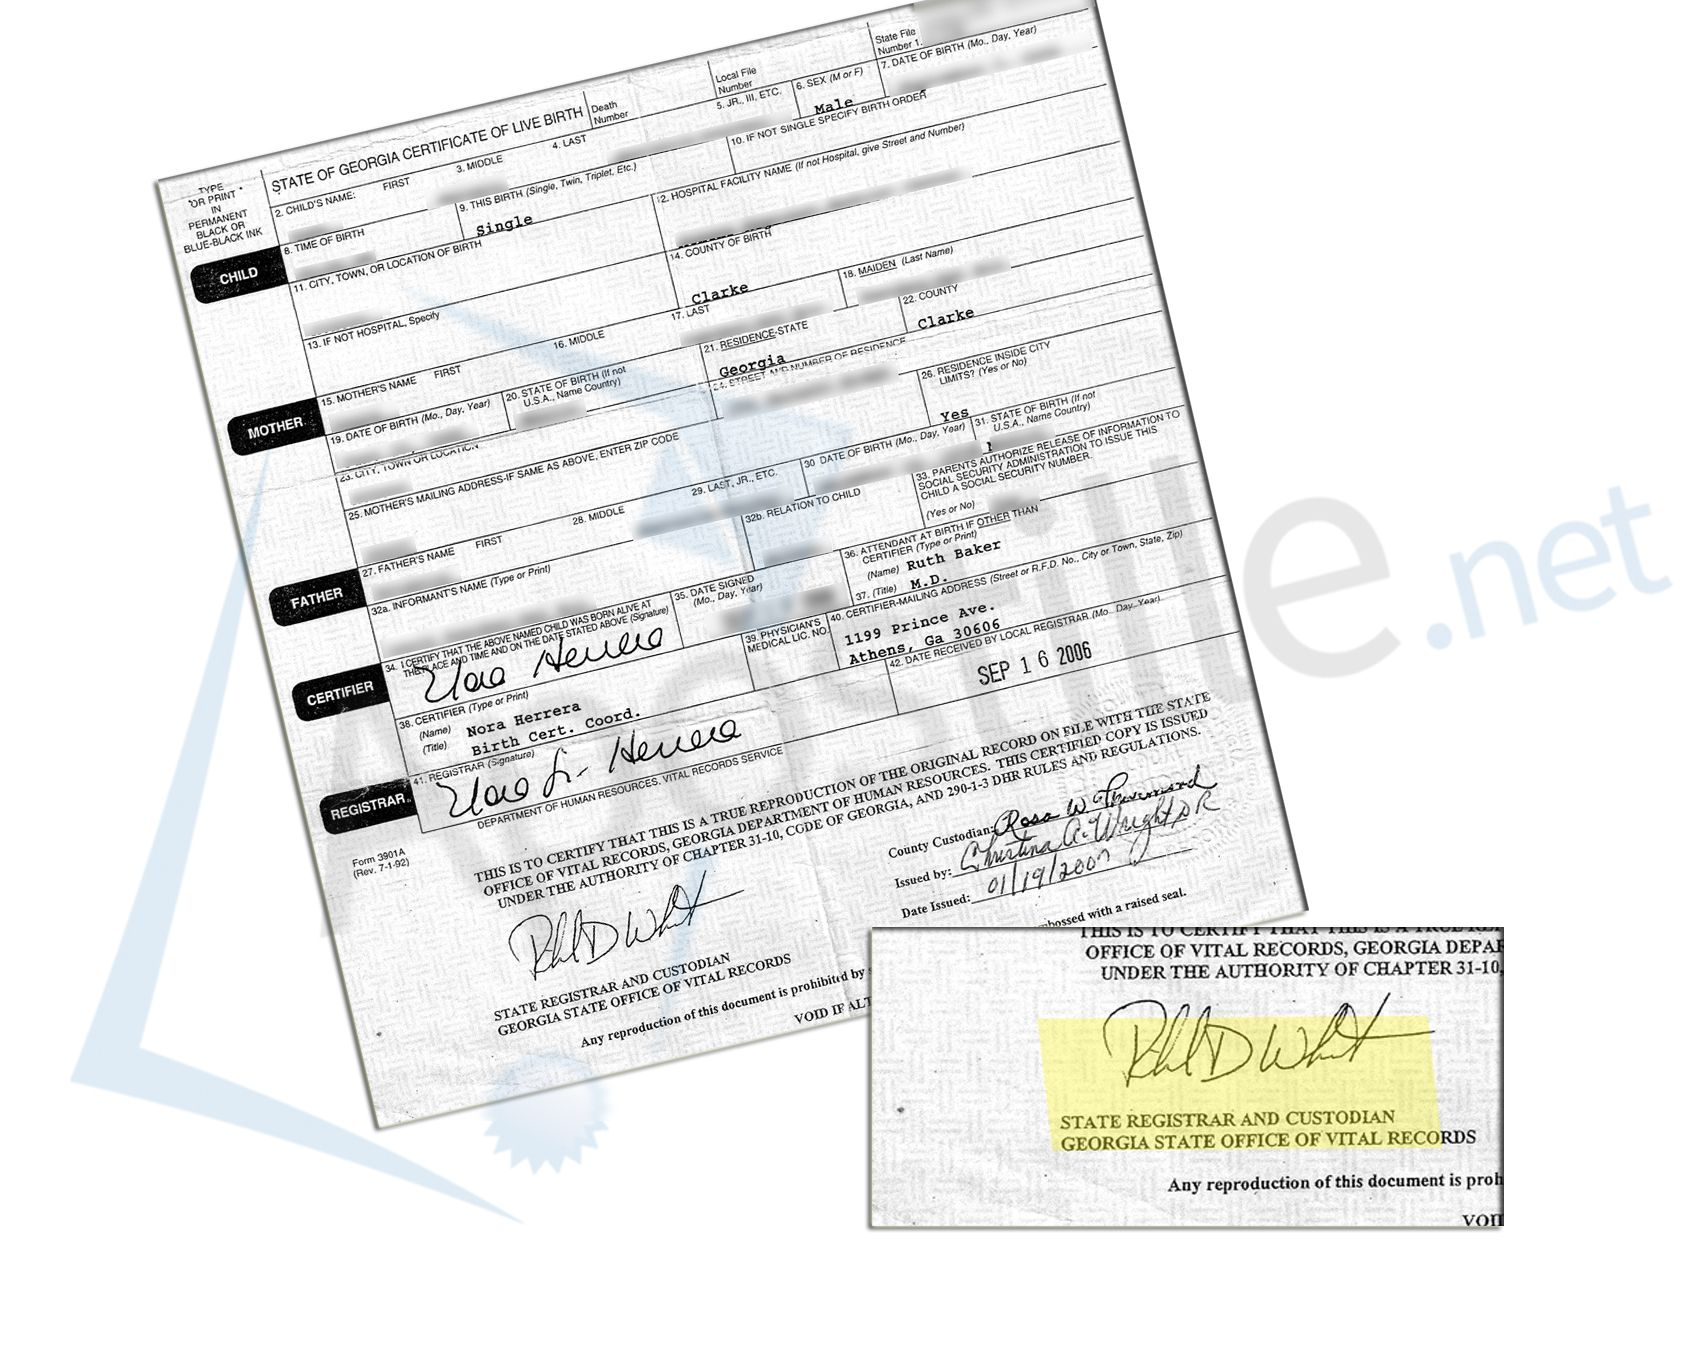 County of clarke georgia birth certificate signed by the state county of clarke georgia birth certificate signed by the state registrar xflitez Choice Image